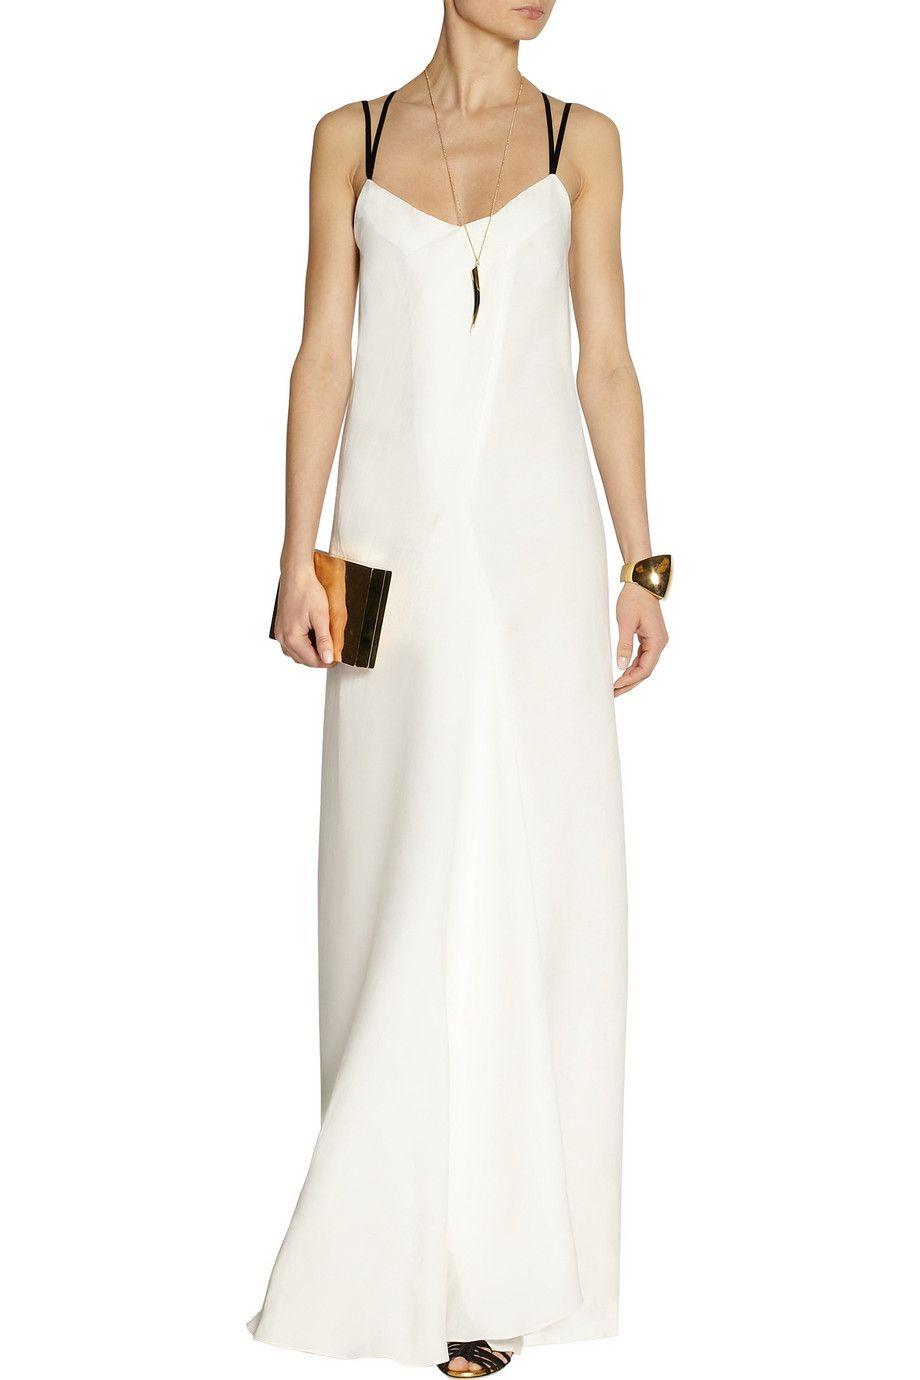 Maiyet linenblend slipstyle maxi dressclose up style